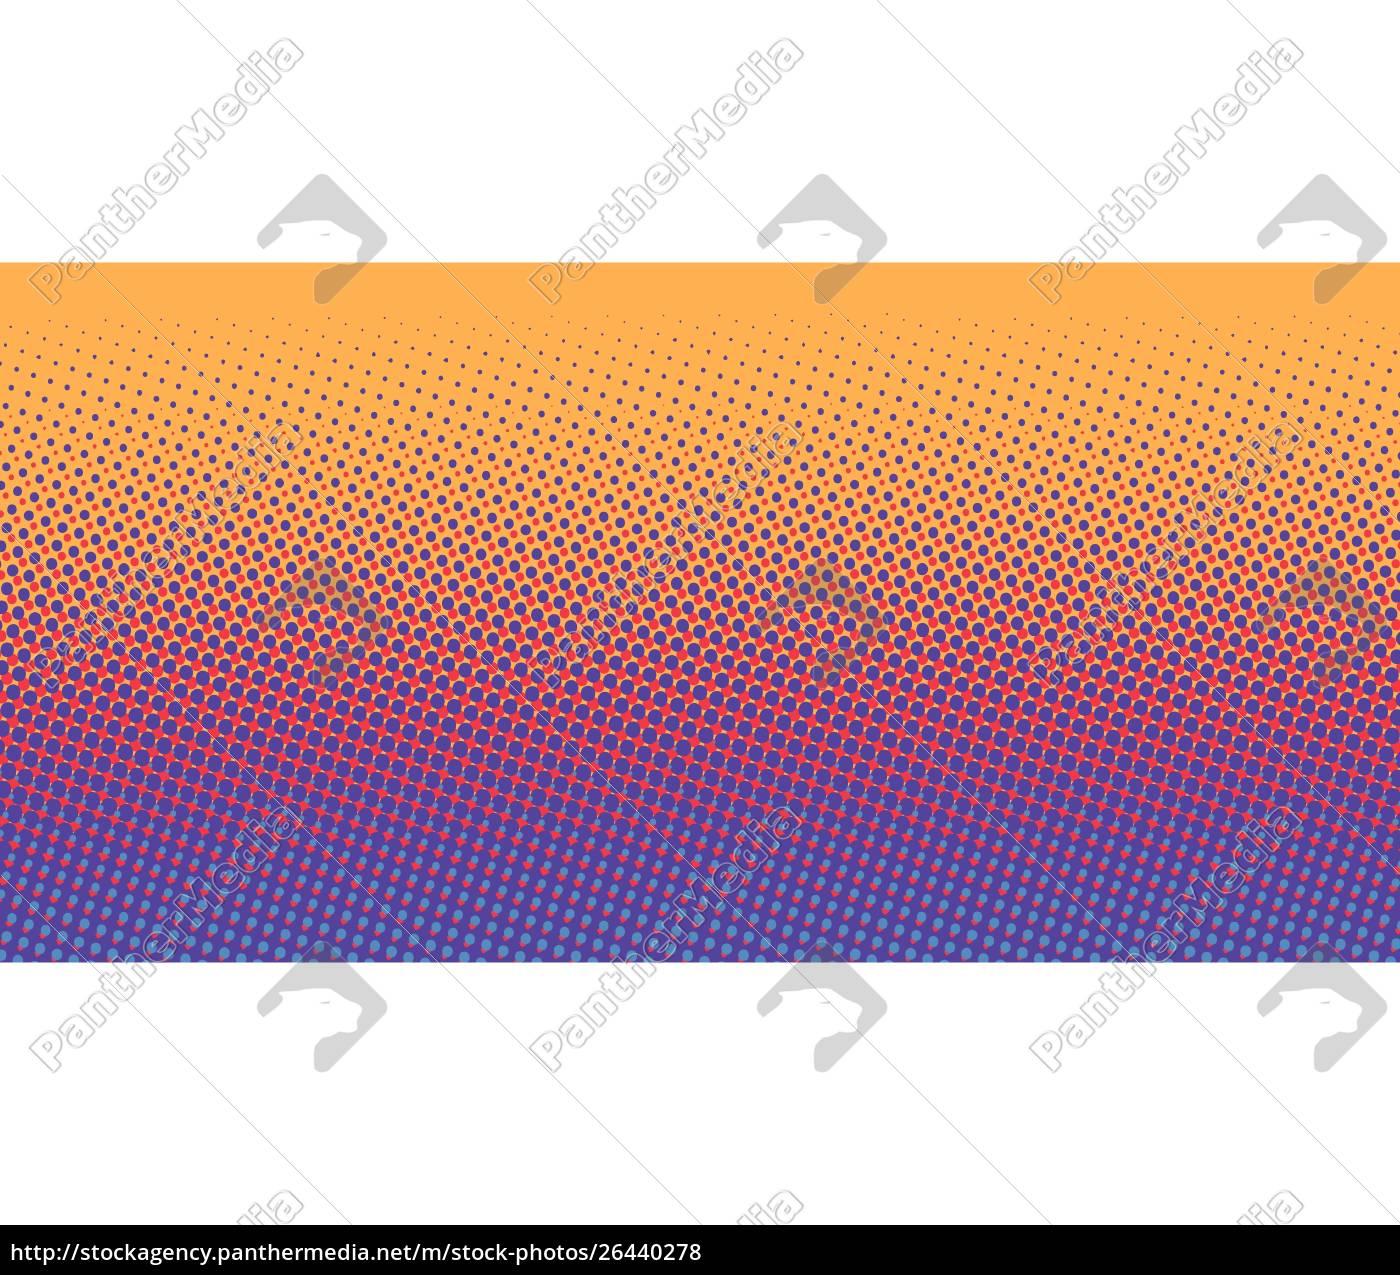 orange, blue, gradient, halftone, background - 26440278